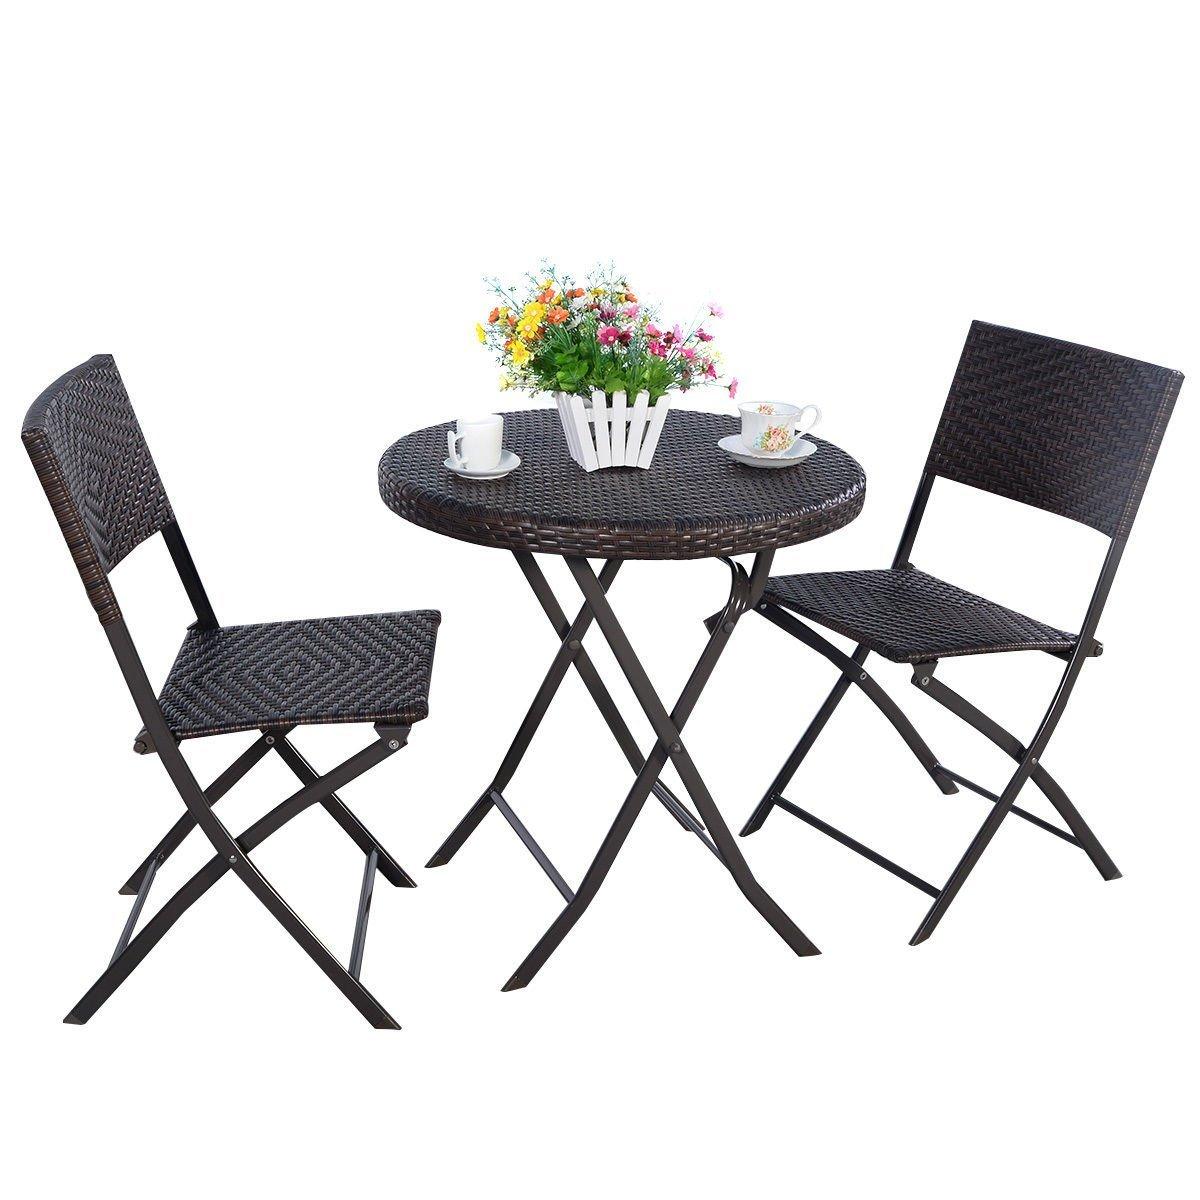 Amazon.com: giantex 3pc silla plegable de mesa redonda ...